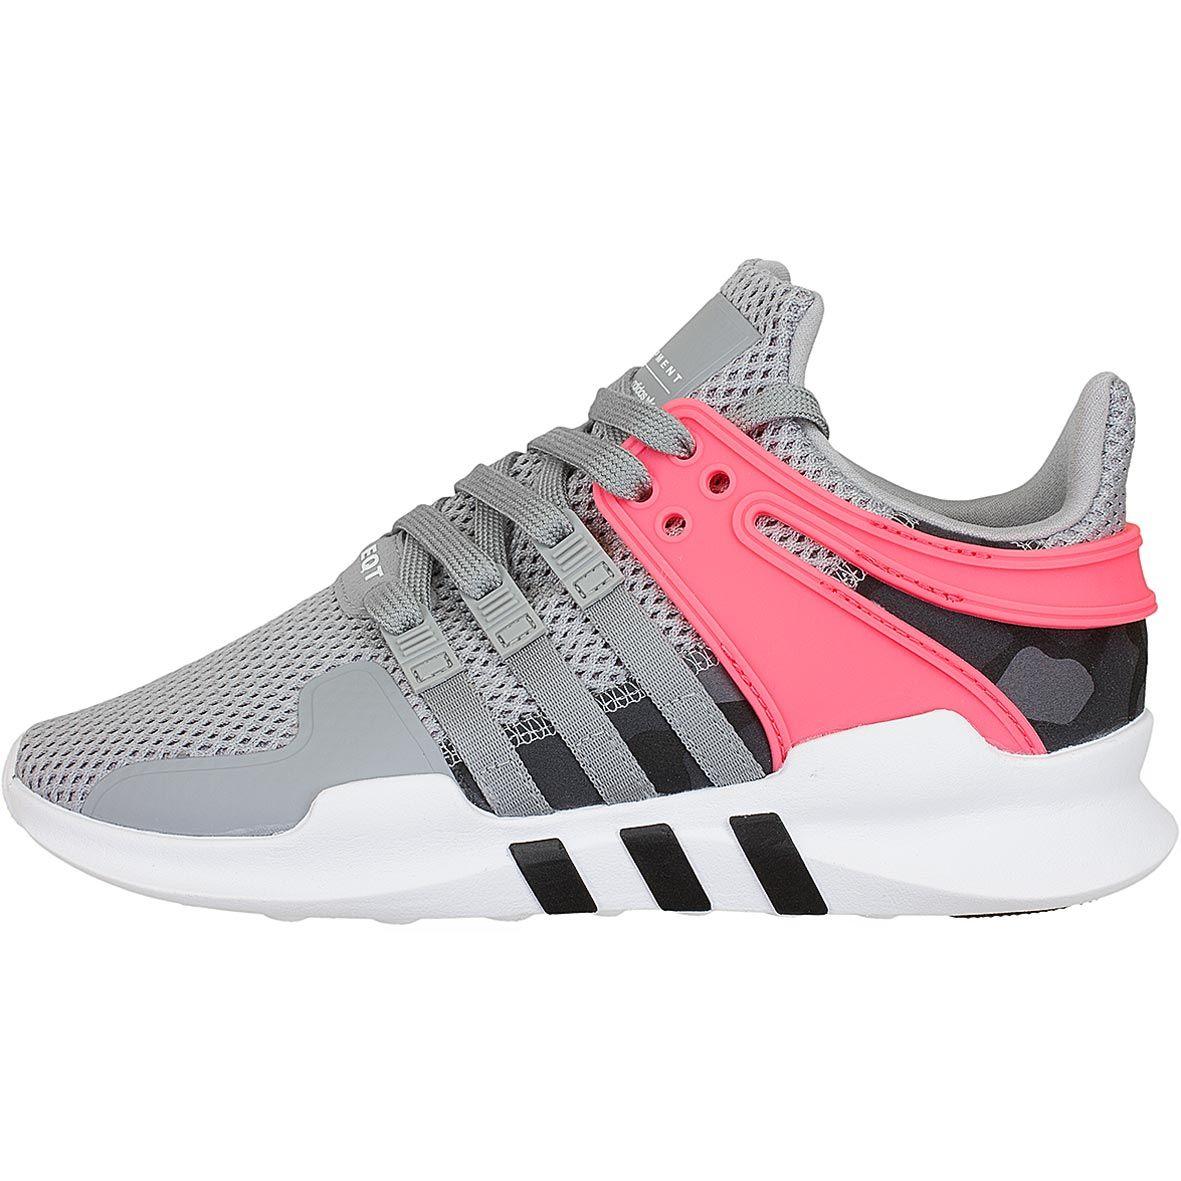 Adidas Originals Damen Sneaker Equipment Support ADV grau ... schwarz ... grau 53dbfd